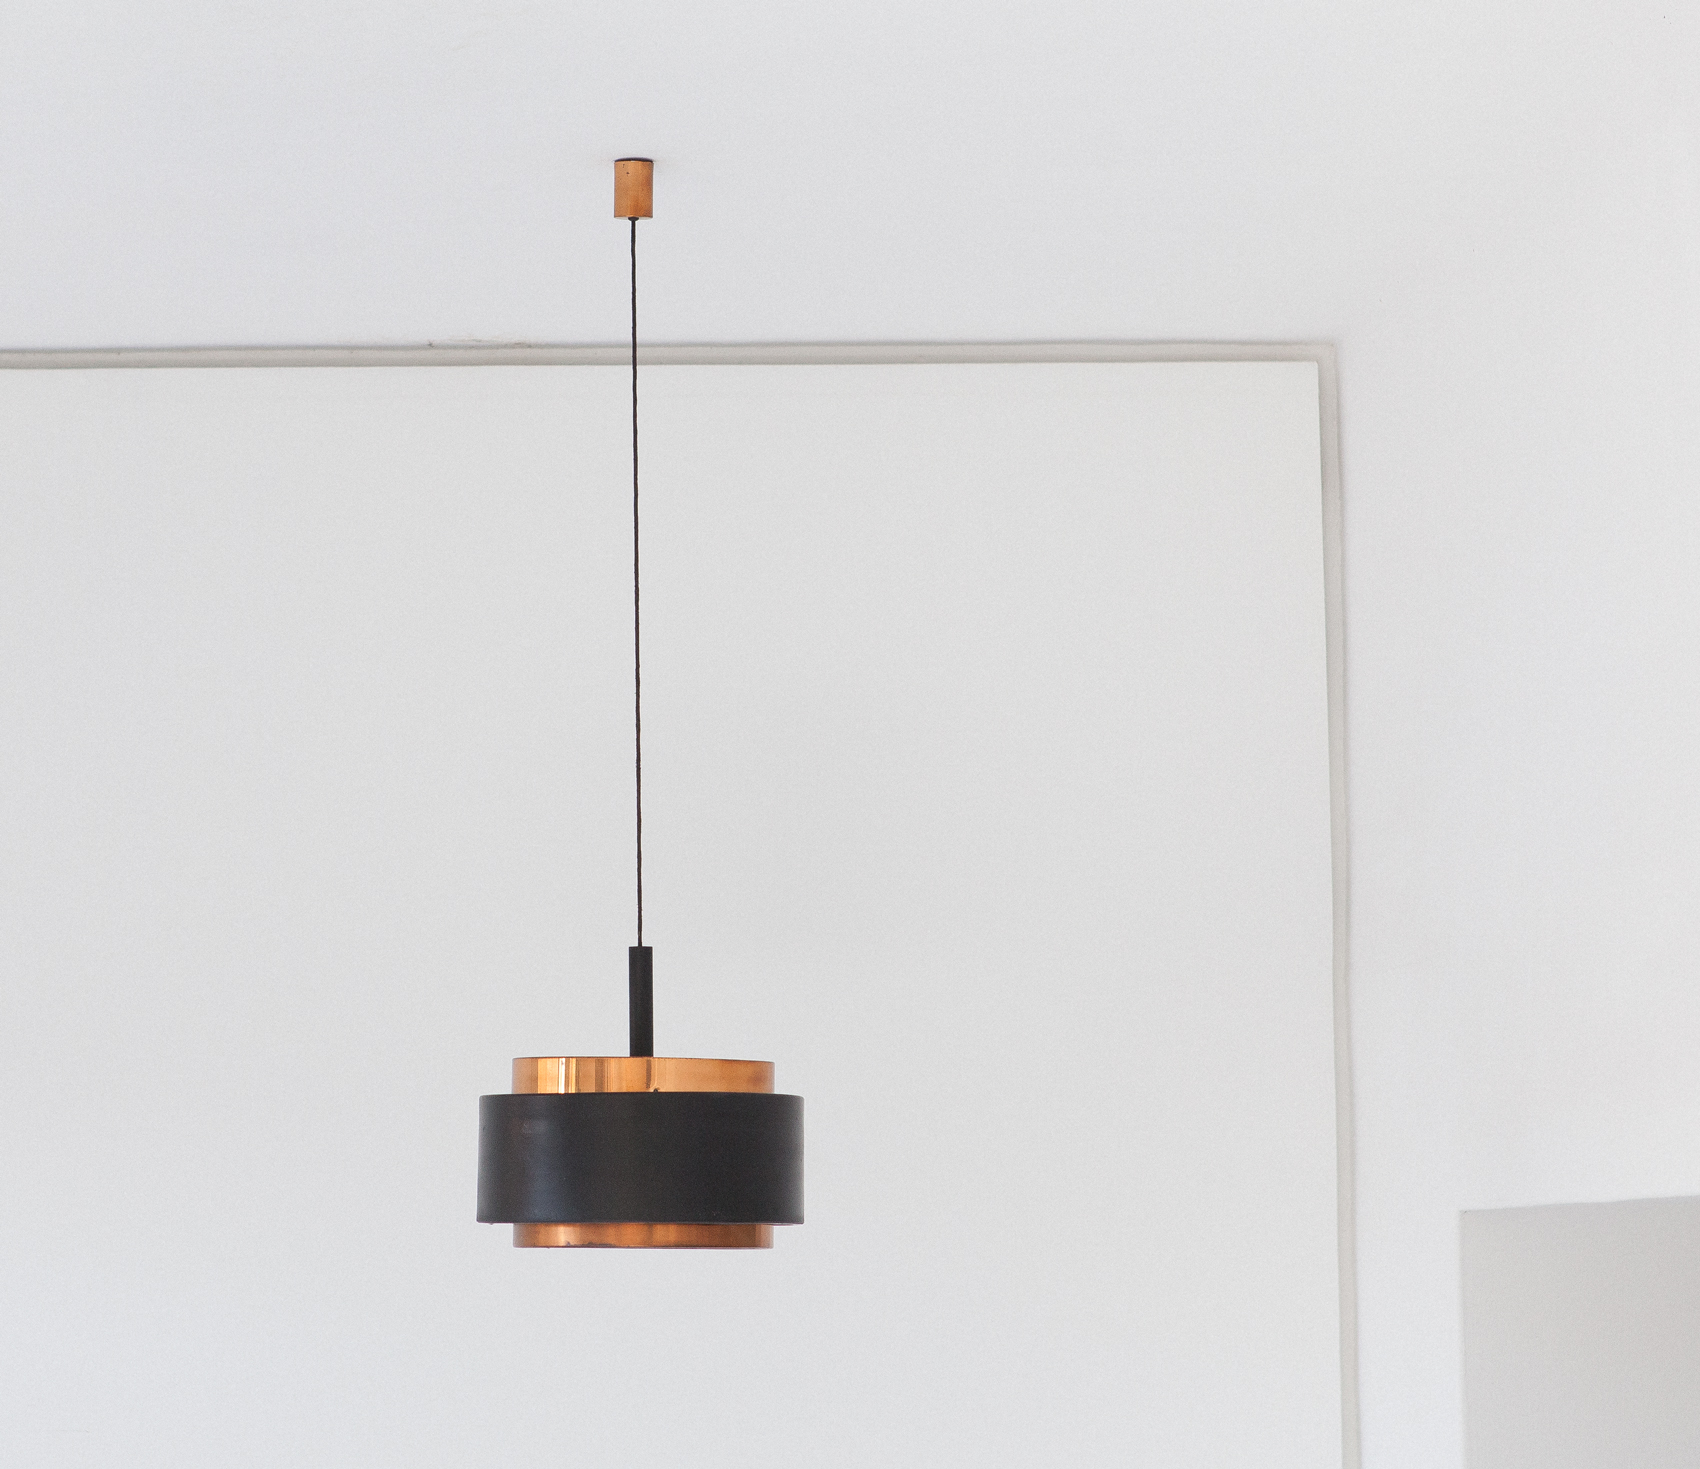 lighting-75.5